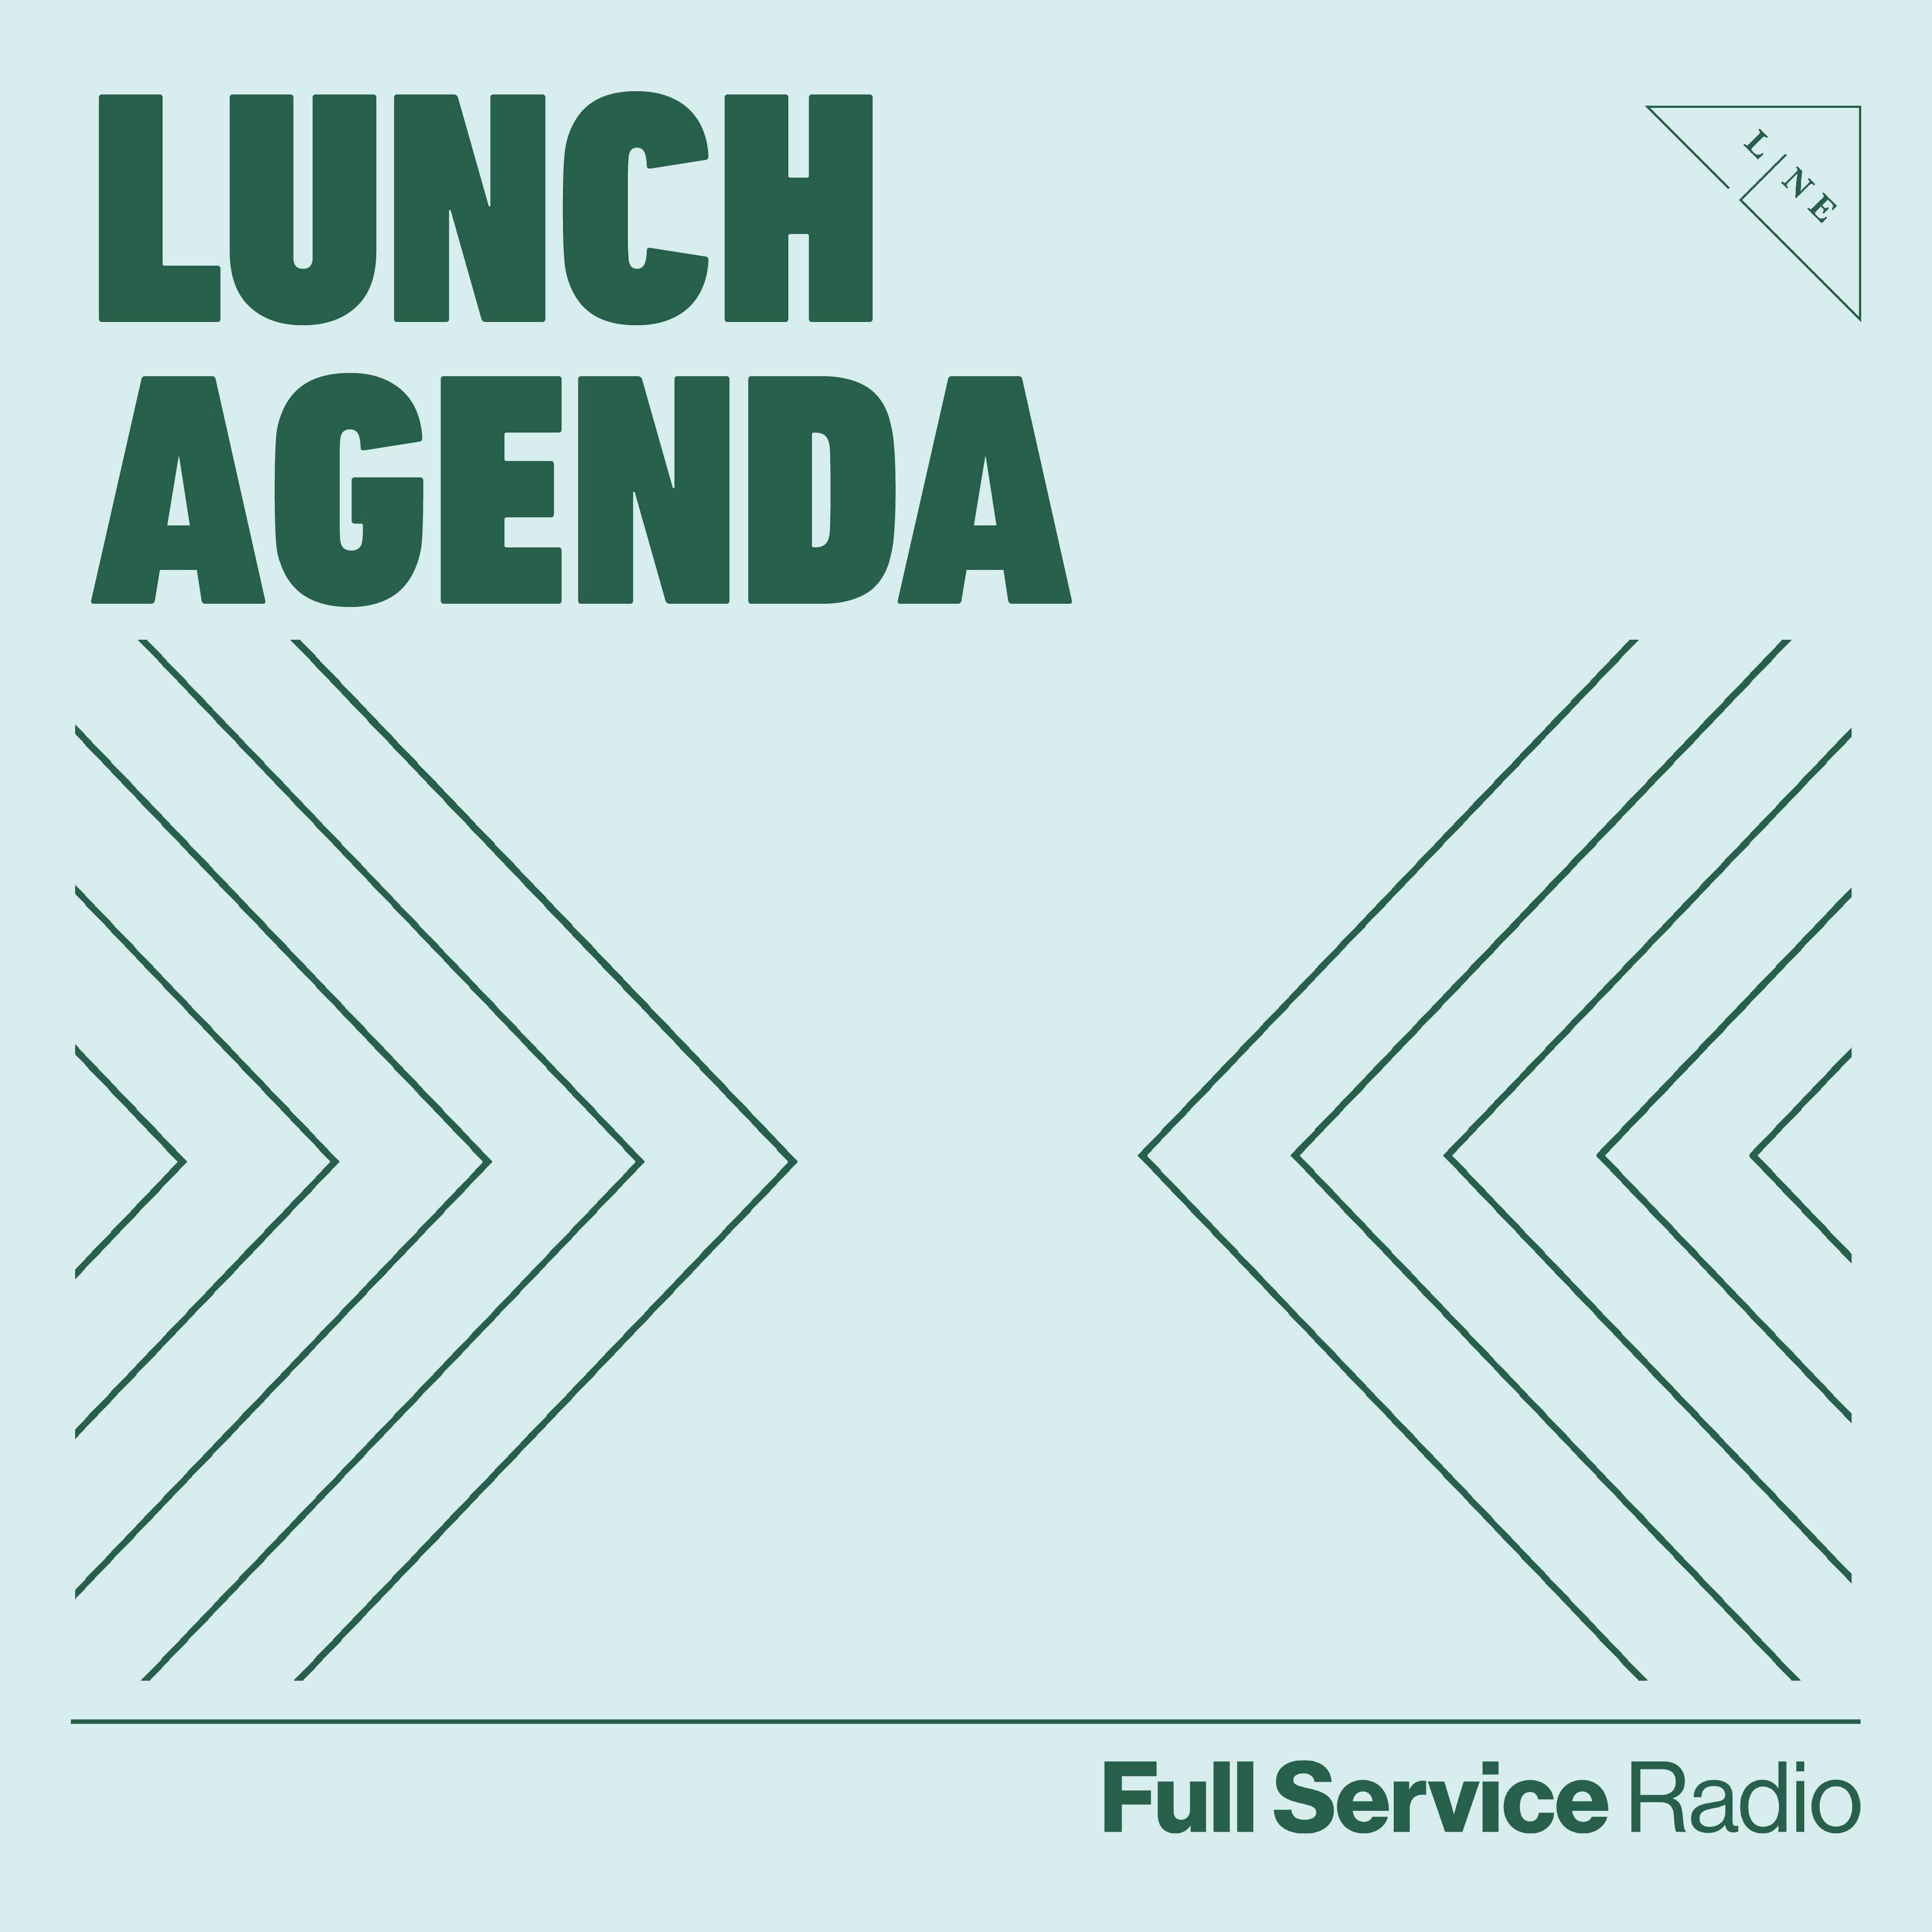 Lunch 20agenda 01